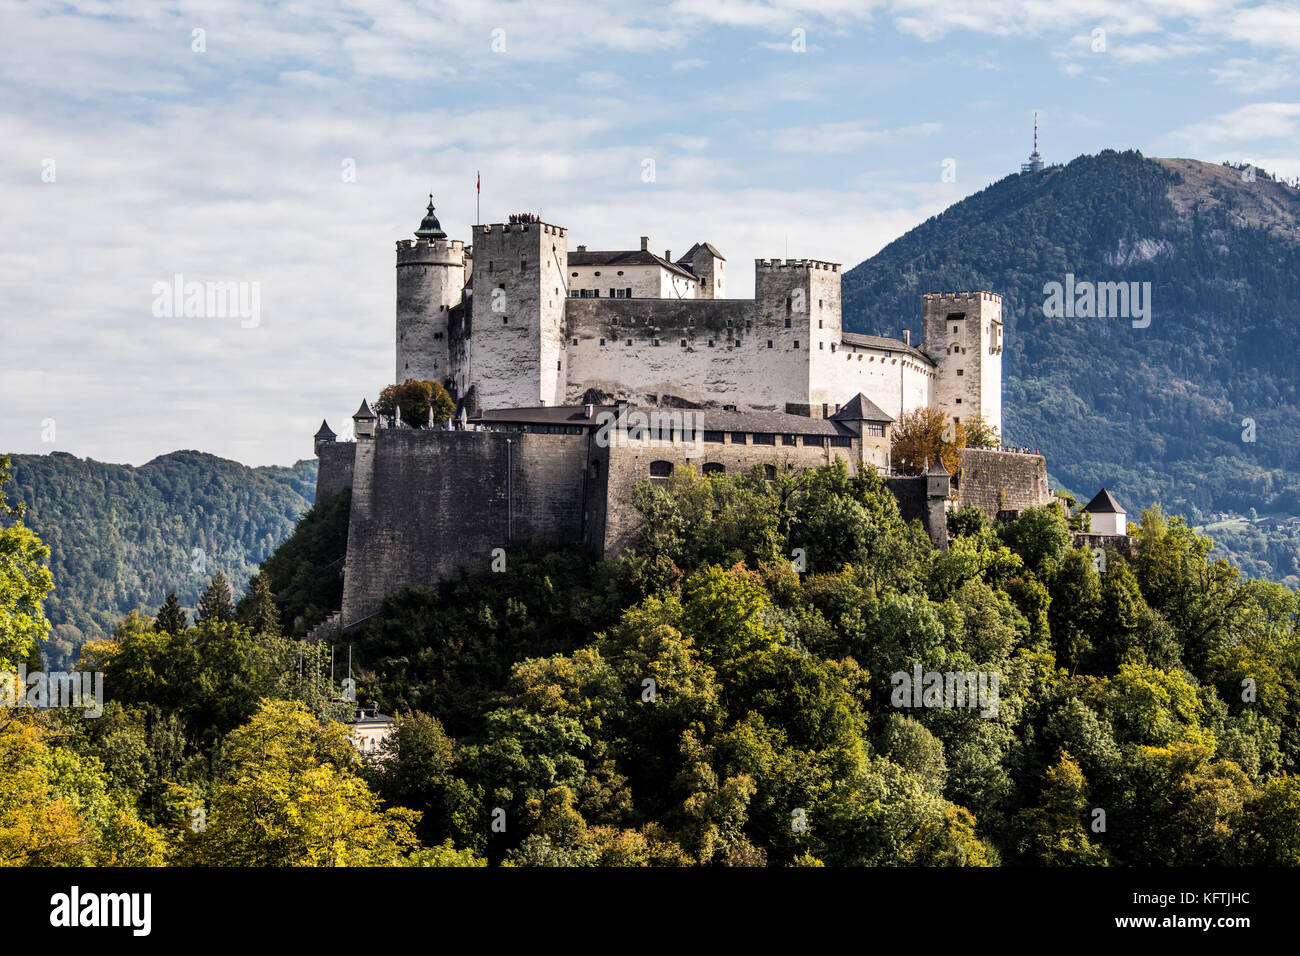 Hohensalzburg Castle in Salzburg, Austria Stock Photo - Alamy